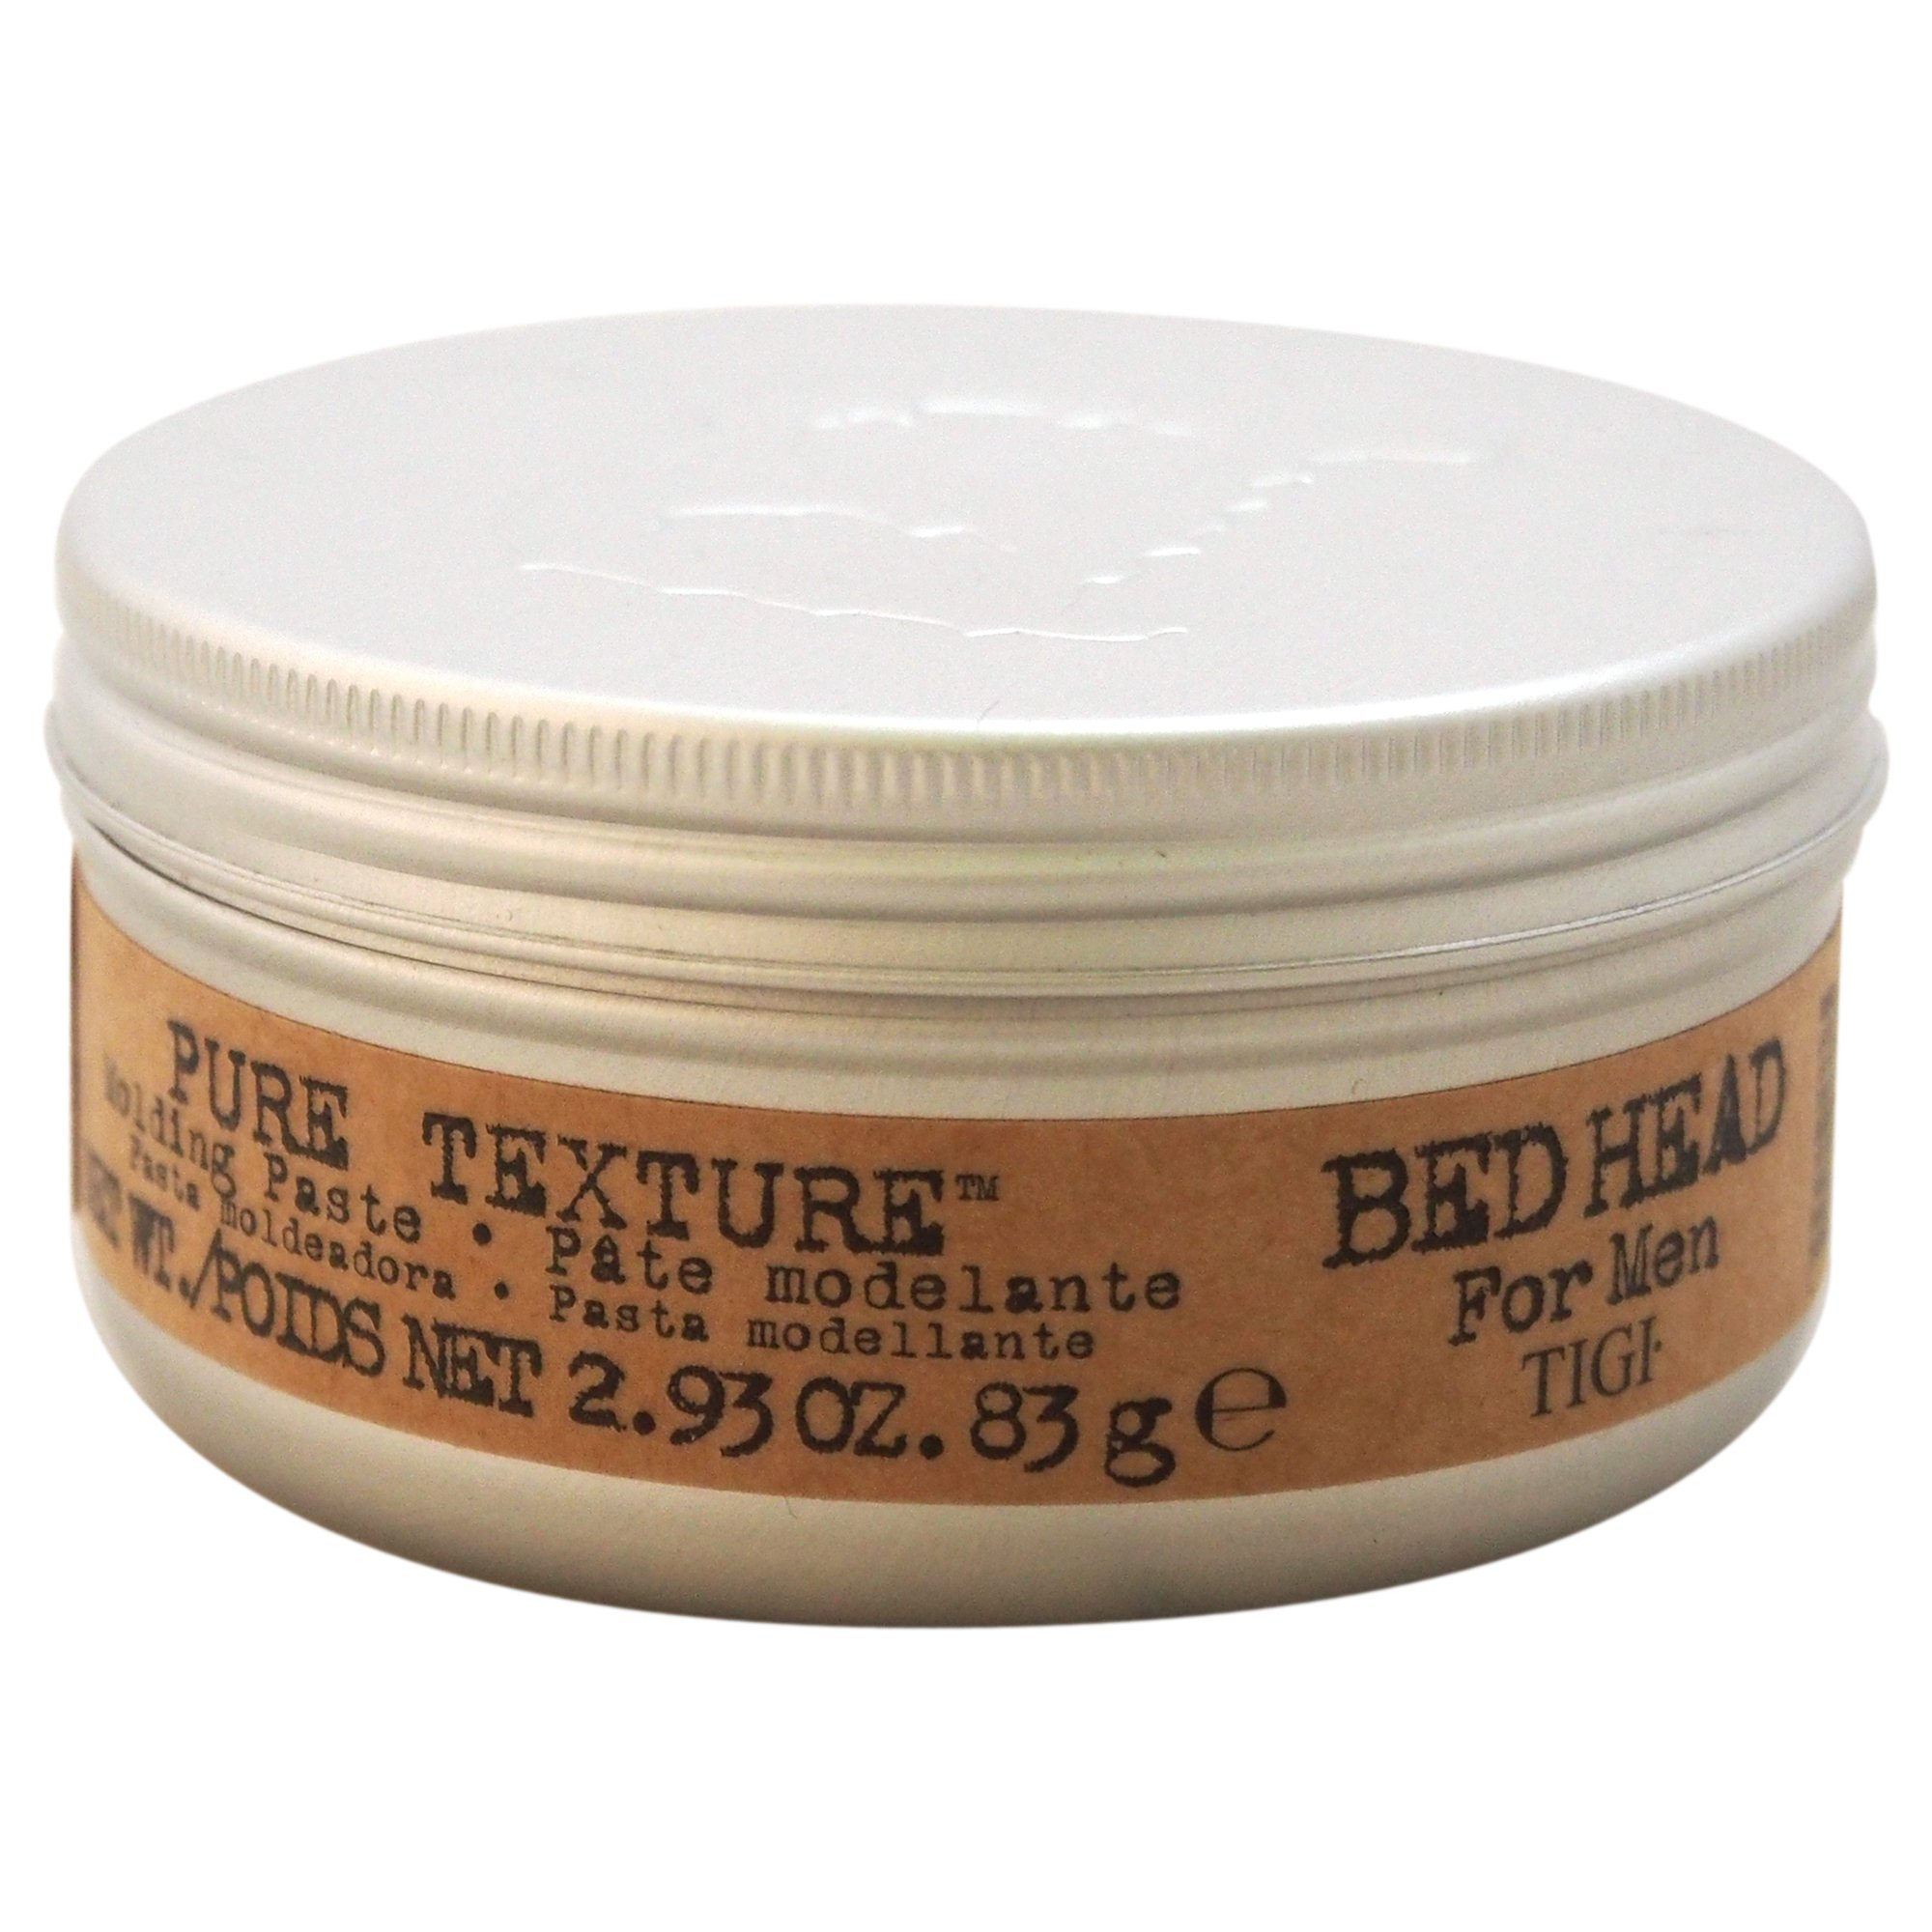 TIGI Bed Head Men Pure Texture Molding Paste, 2.93 Ounce